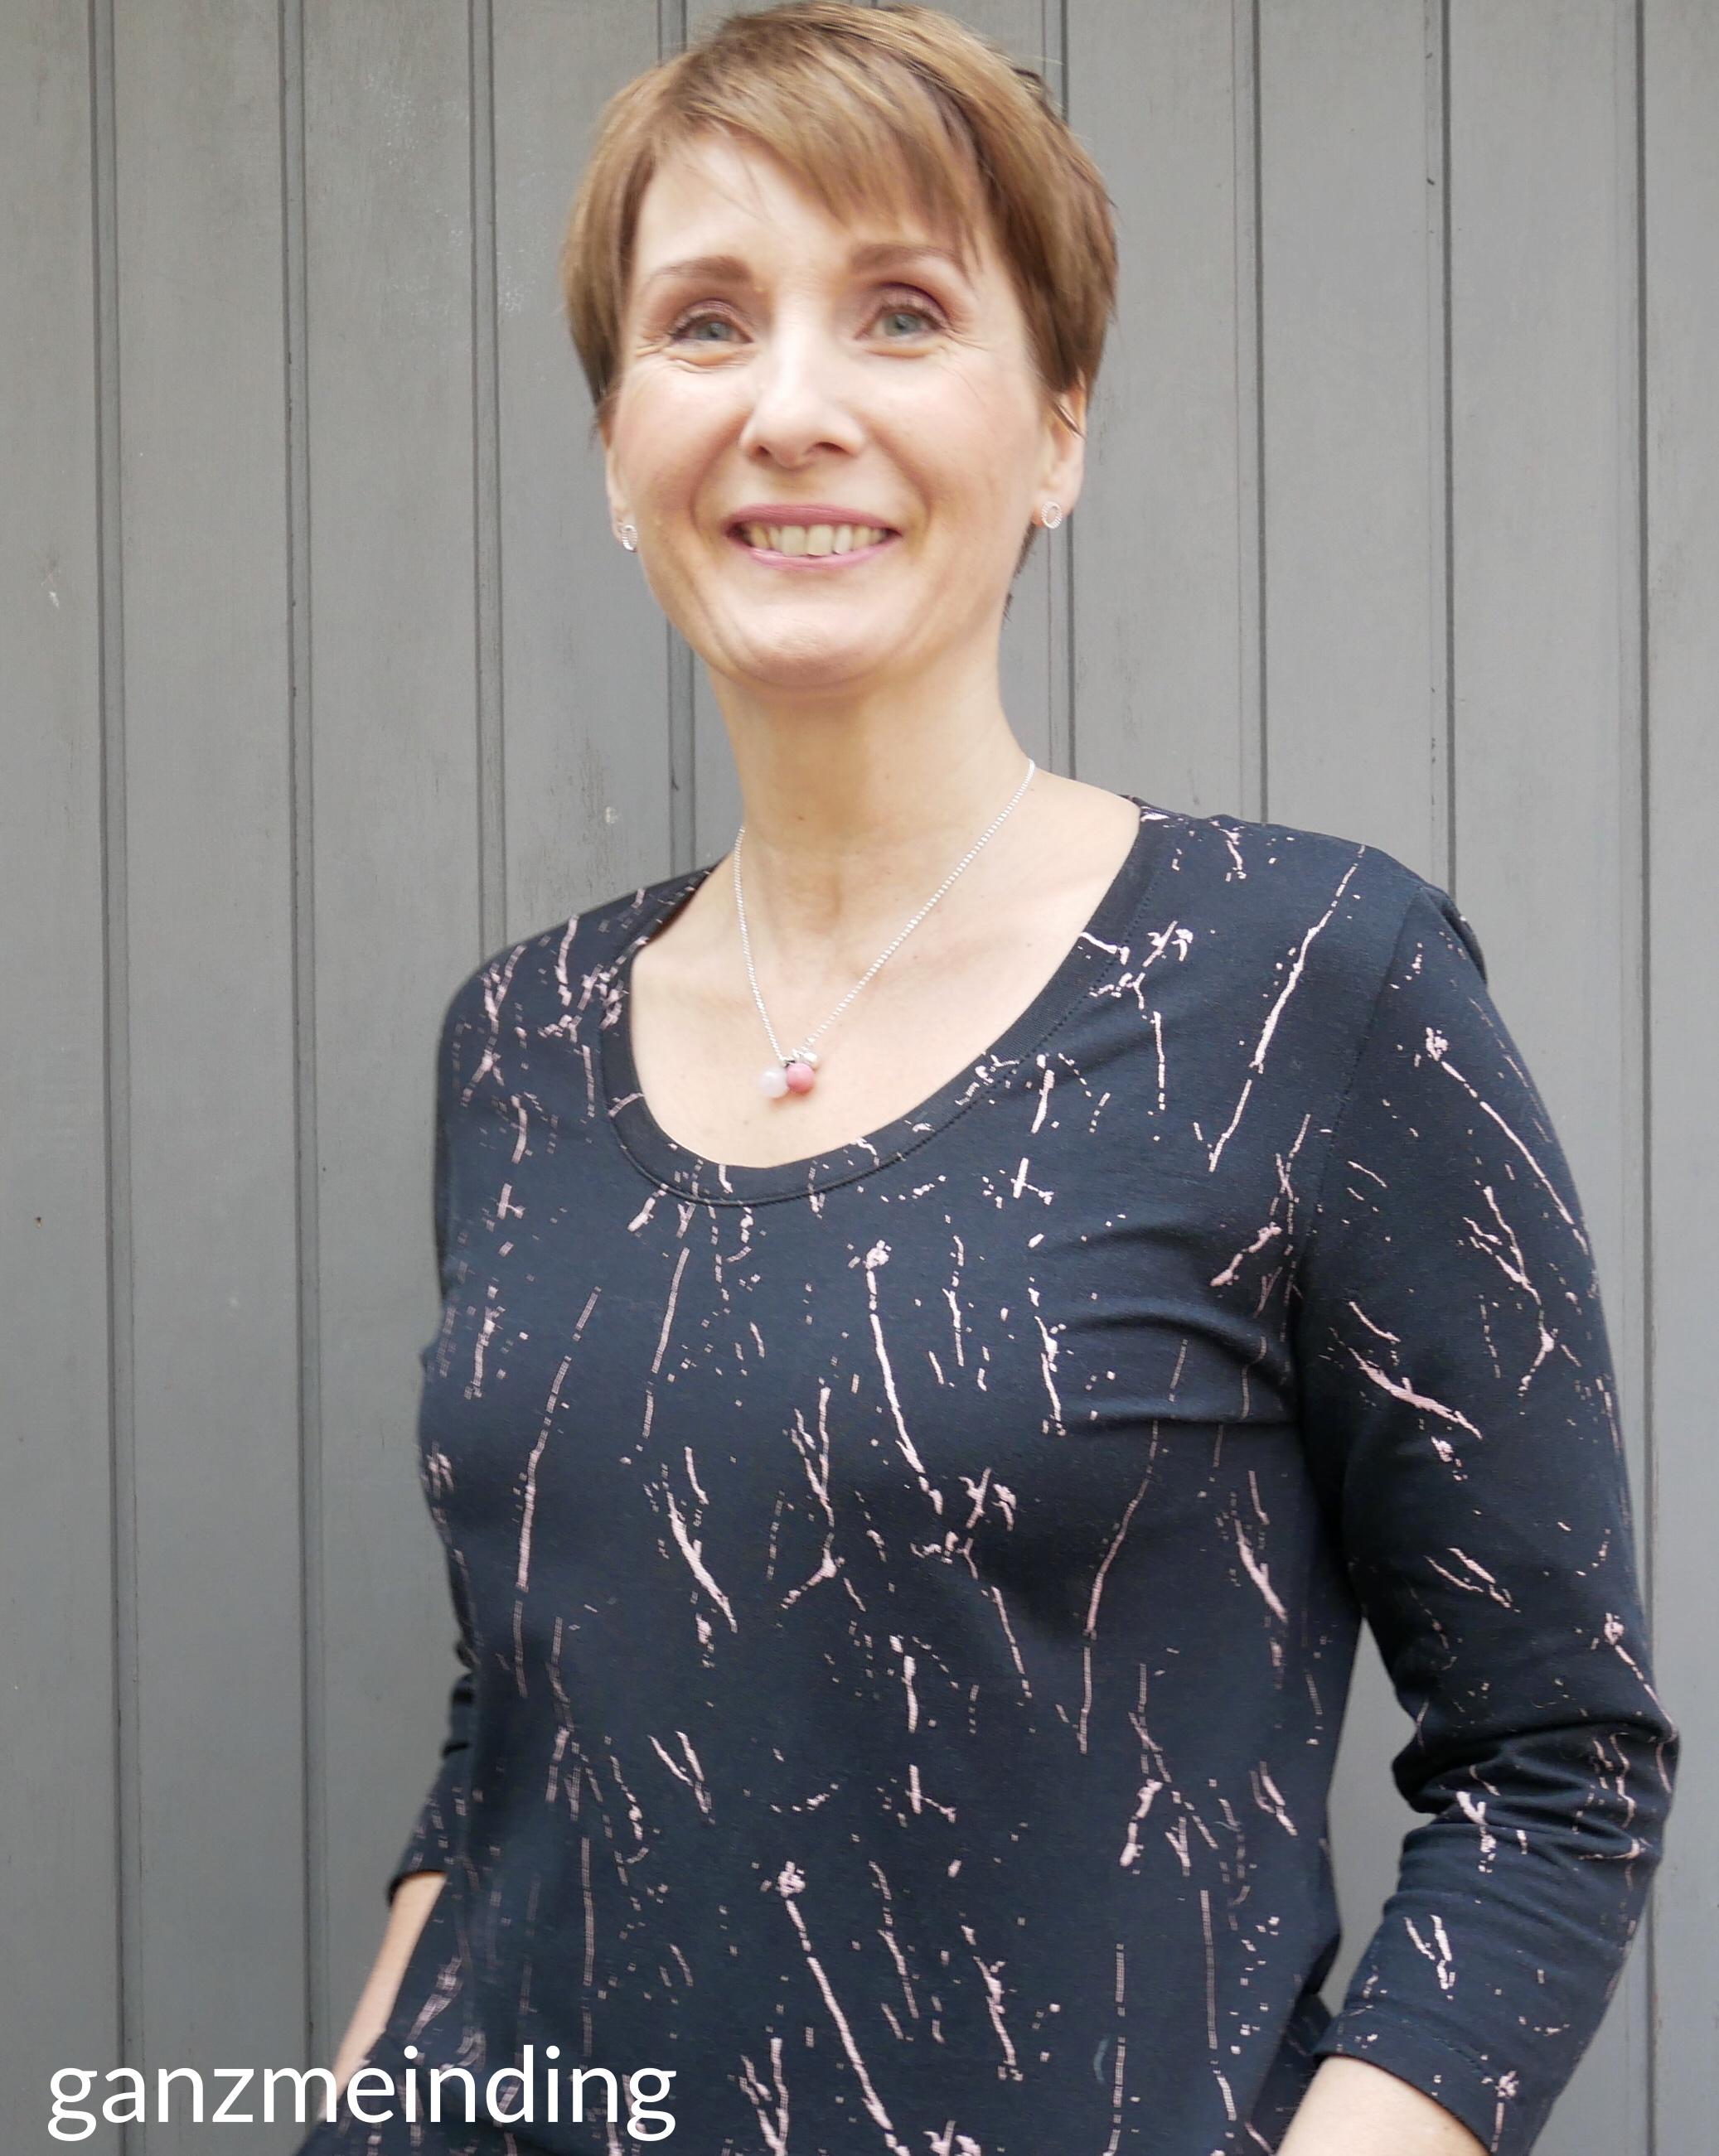 ganzmeinding: Frau Fannie studio schnittreif about blue fabrics blackslash 05